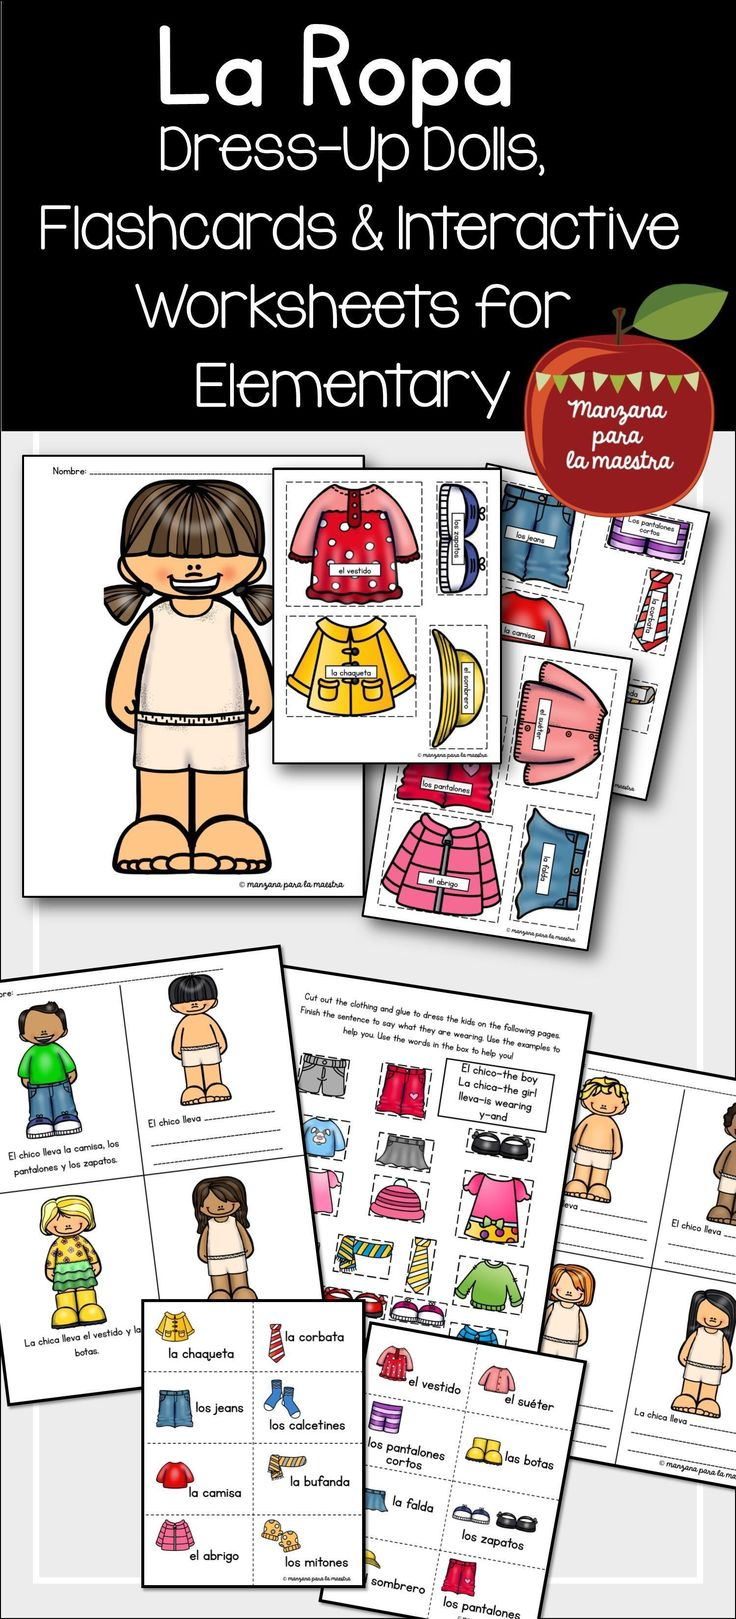 Spanish clothing la ropa homeschool elementary spanish lesson kindergaten interactive notebook worksheet activity lesson #spanishlessonactivities #spanishlessons